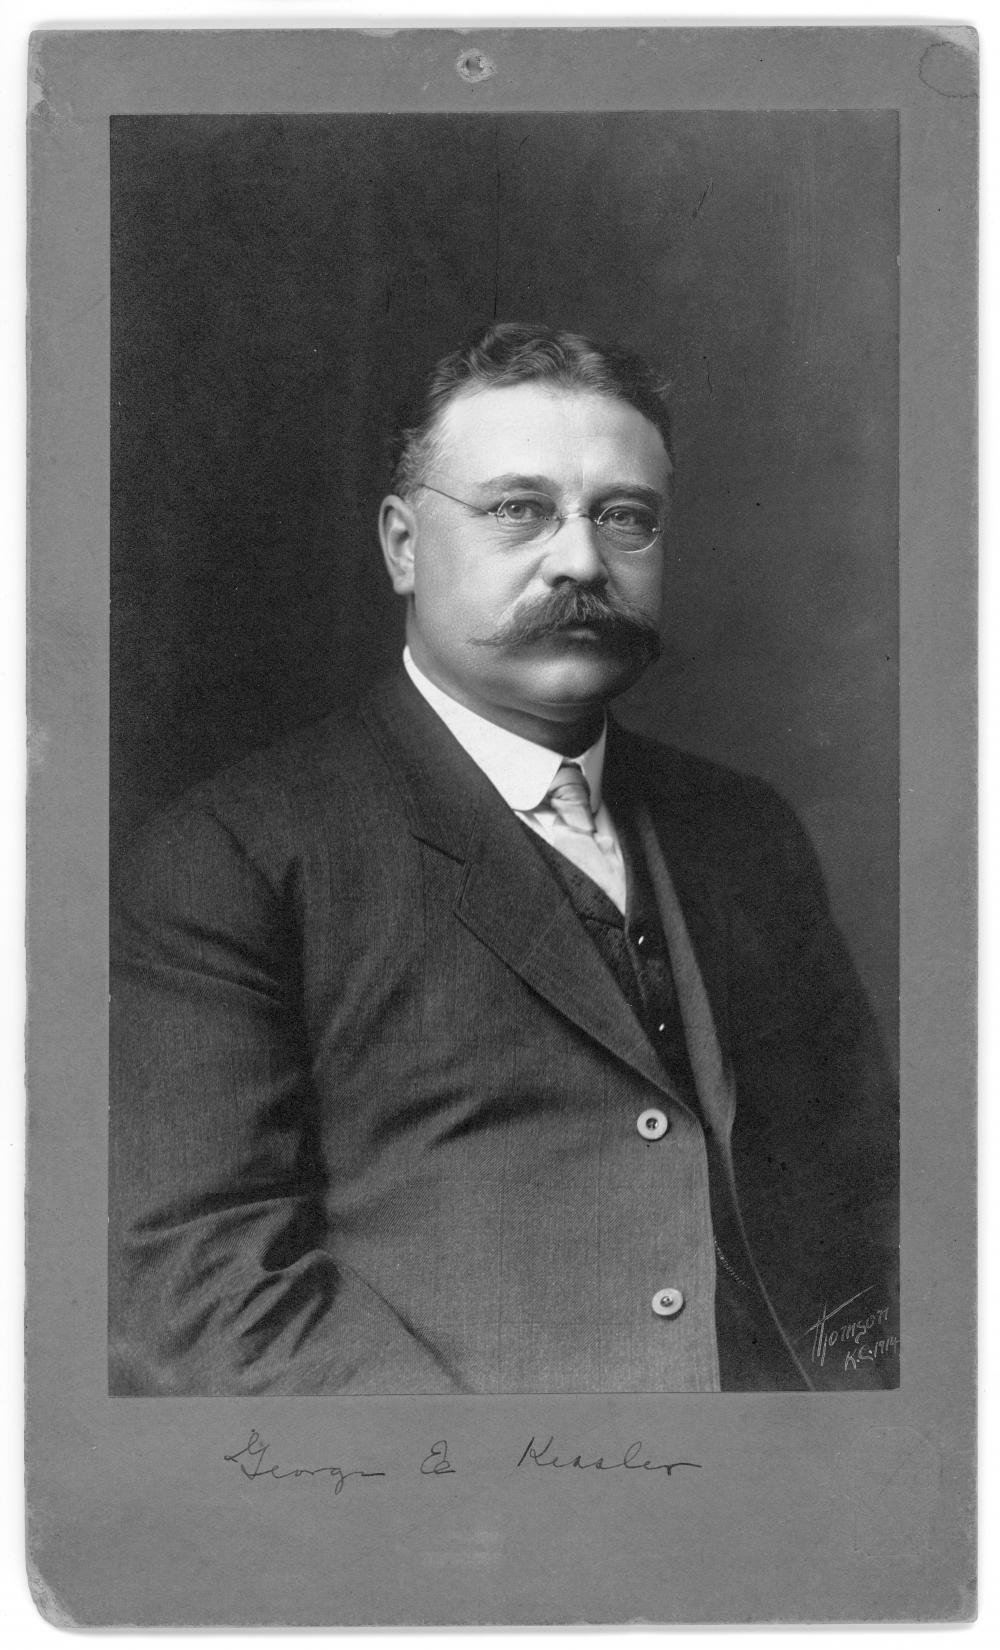 George E. Kessler | The Pendergast Years